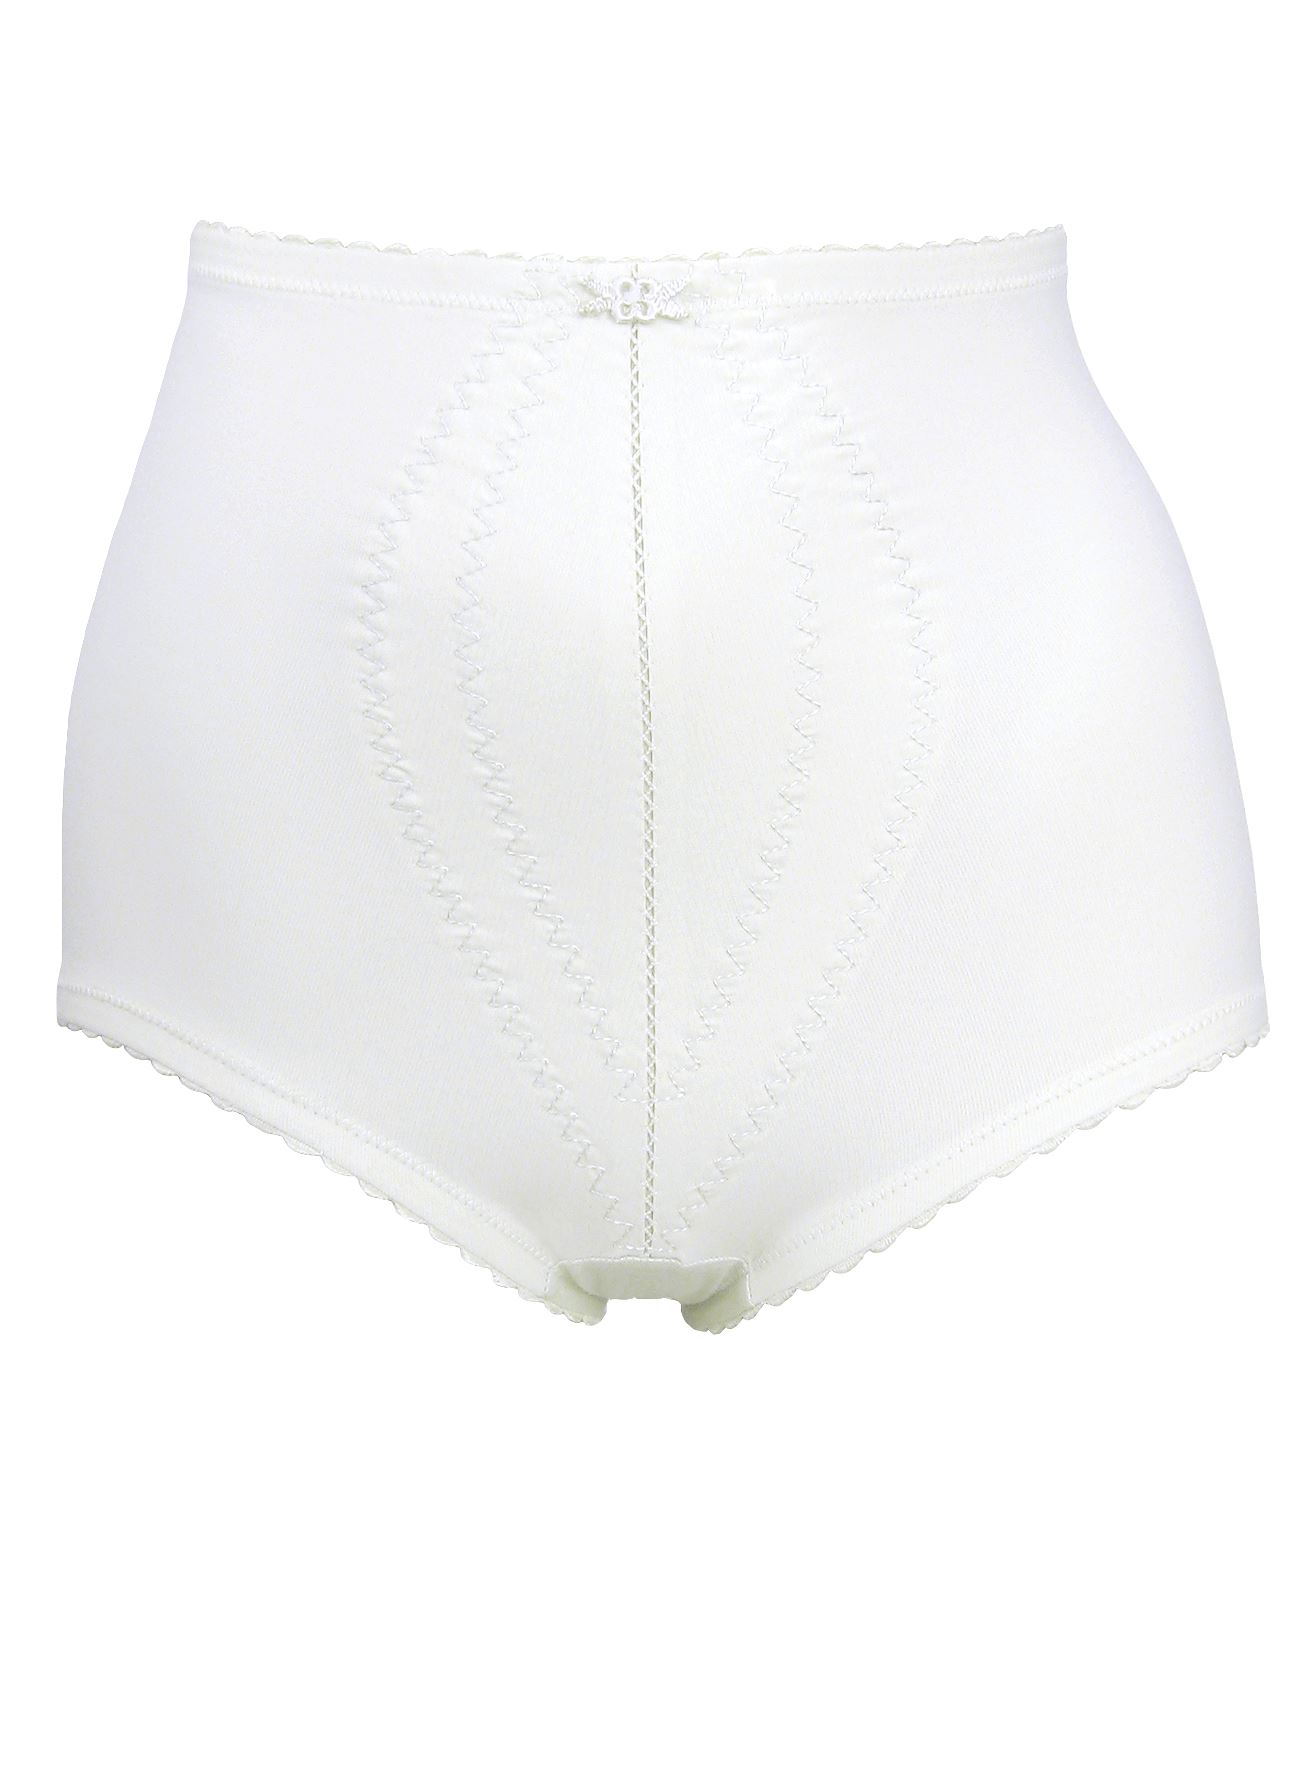 d29c88fccaaaa Playtex Icbiag P2522 Maxi Control Brief Knickers Underwear Shapewear ...